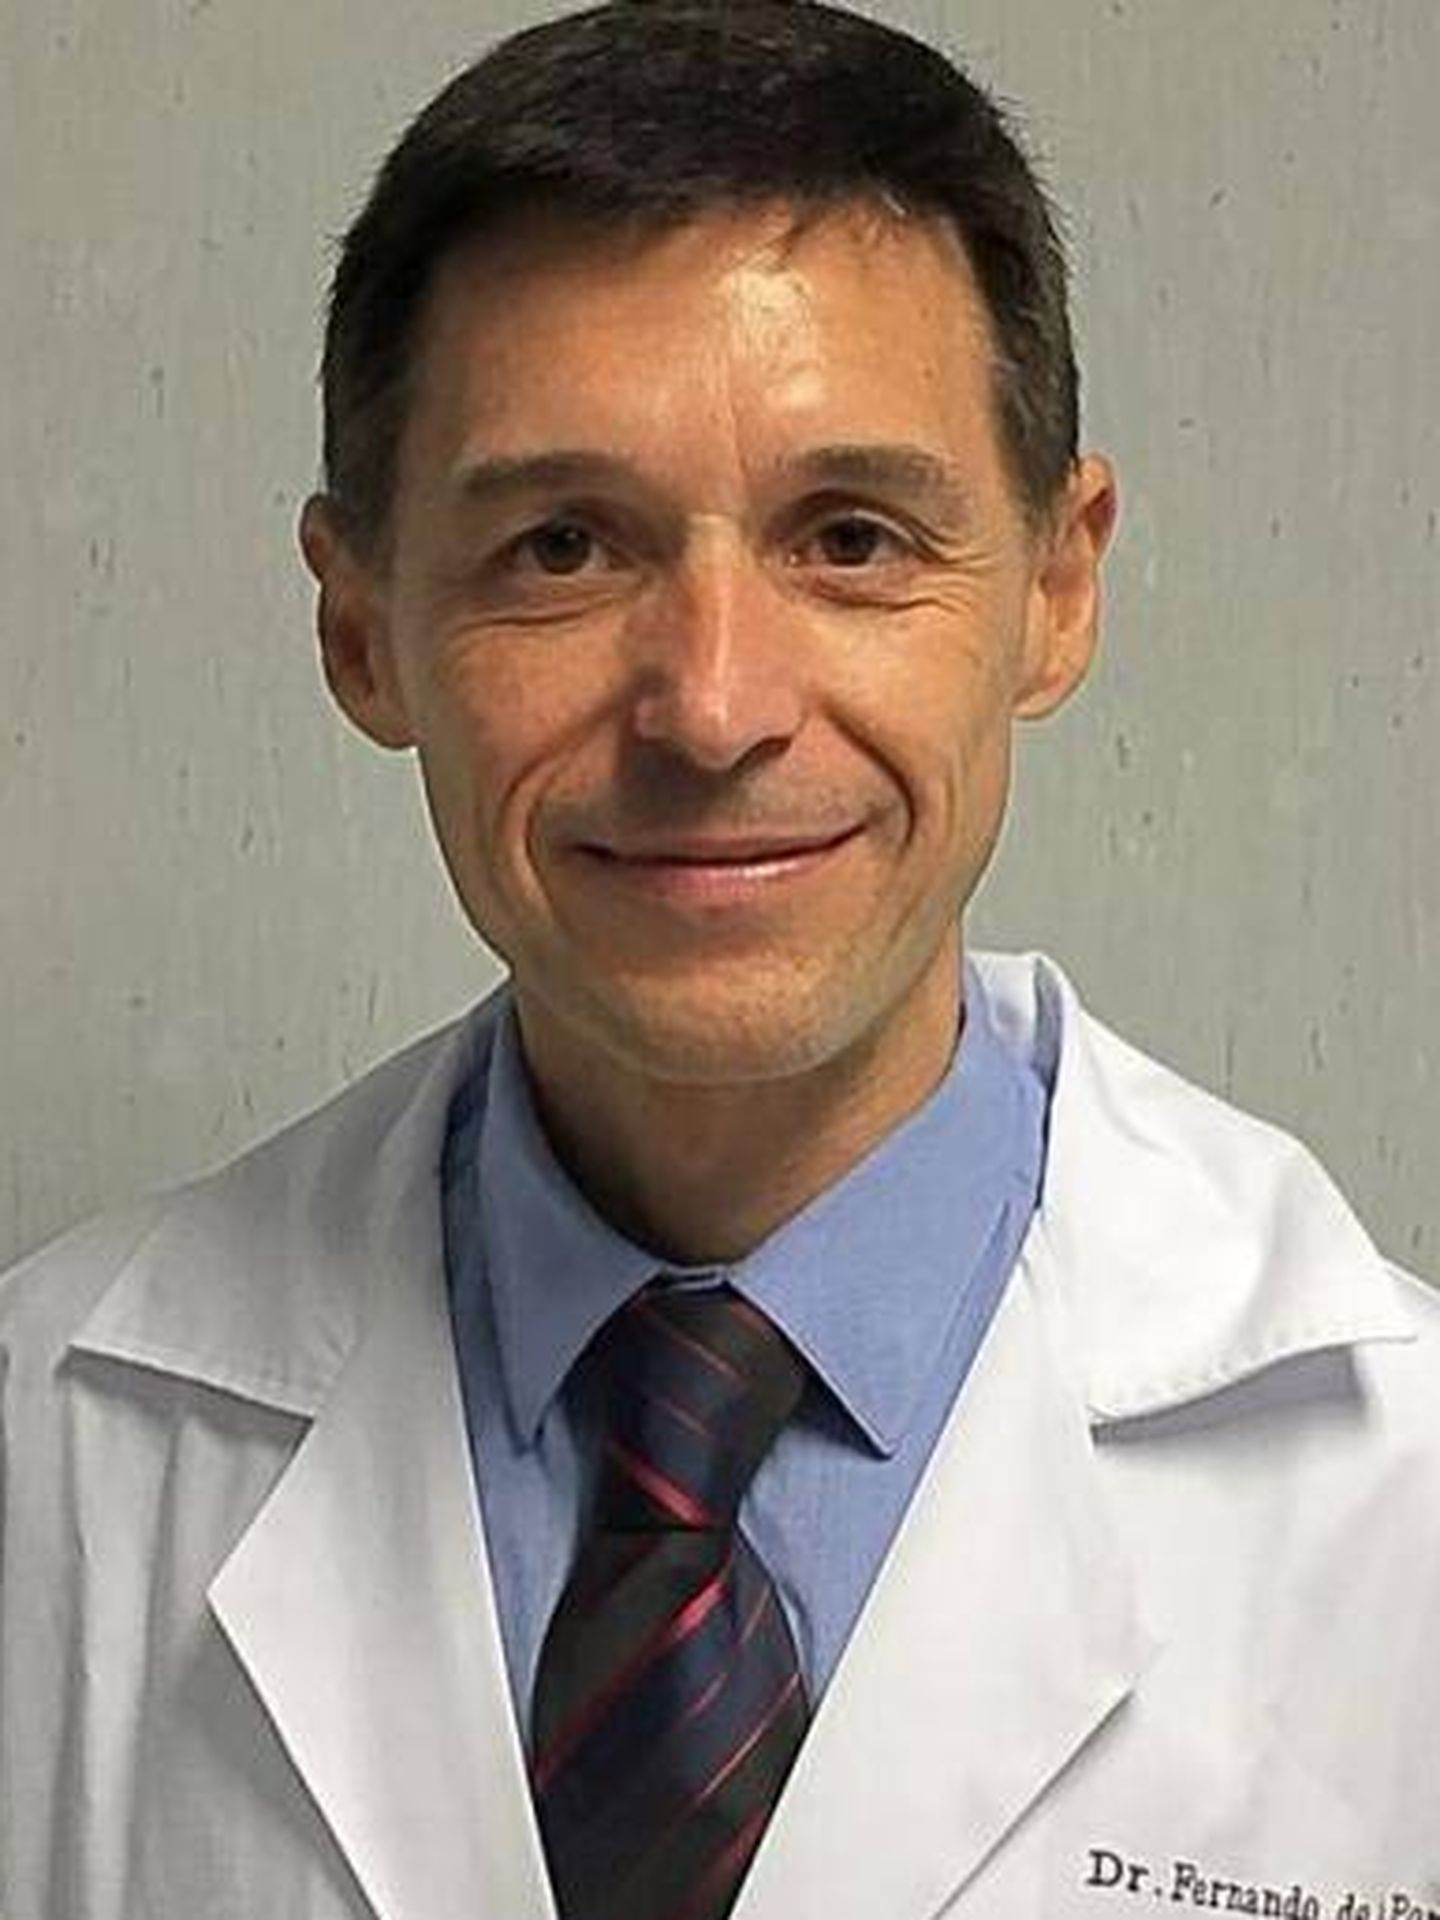 Dr. Fernando de la Portilla.